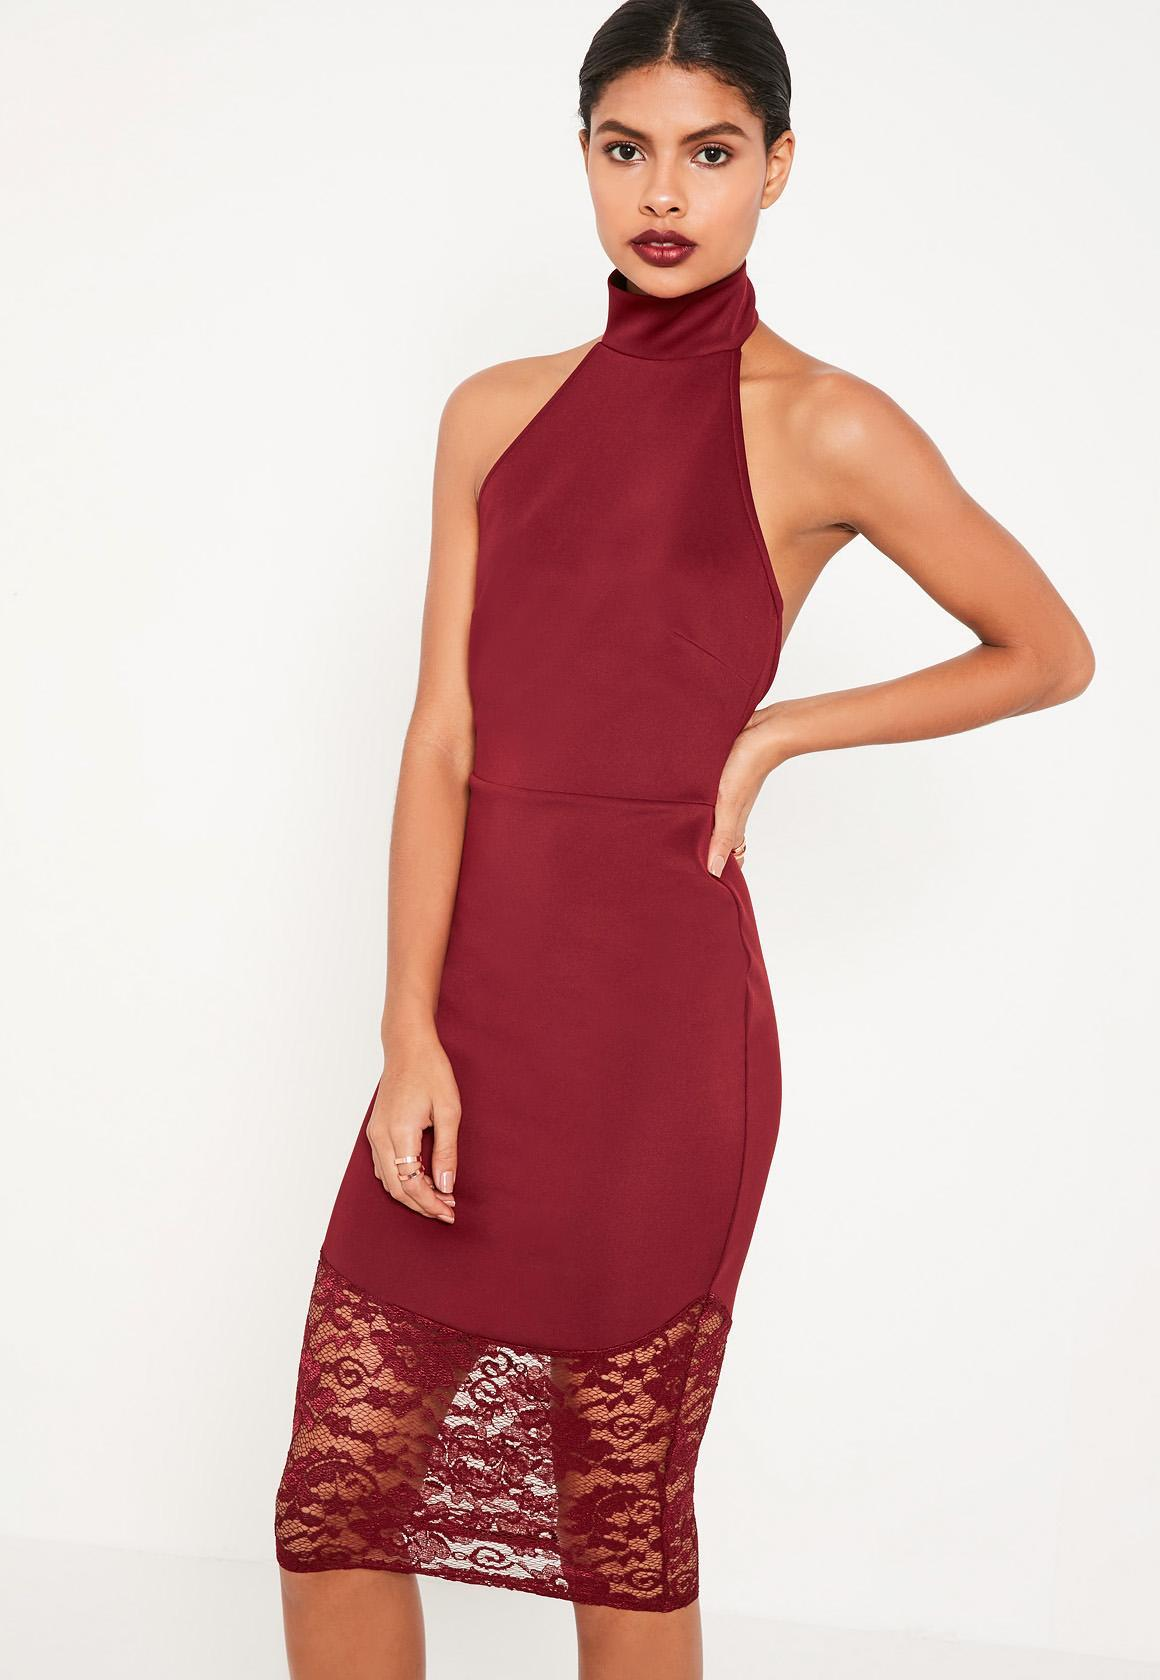 089632d9ef Lyst - Missguided Burgundy Lace Fishtail Halterneck Midi Dress